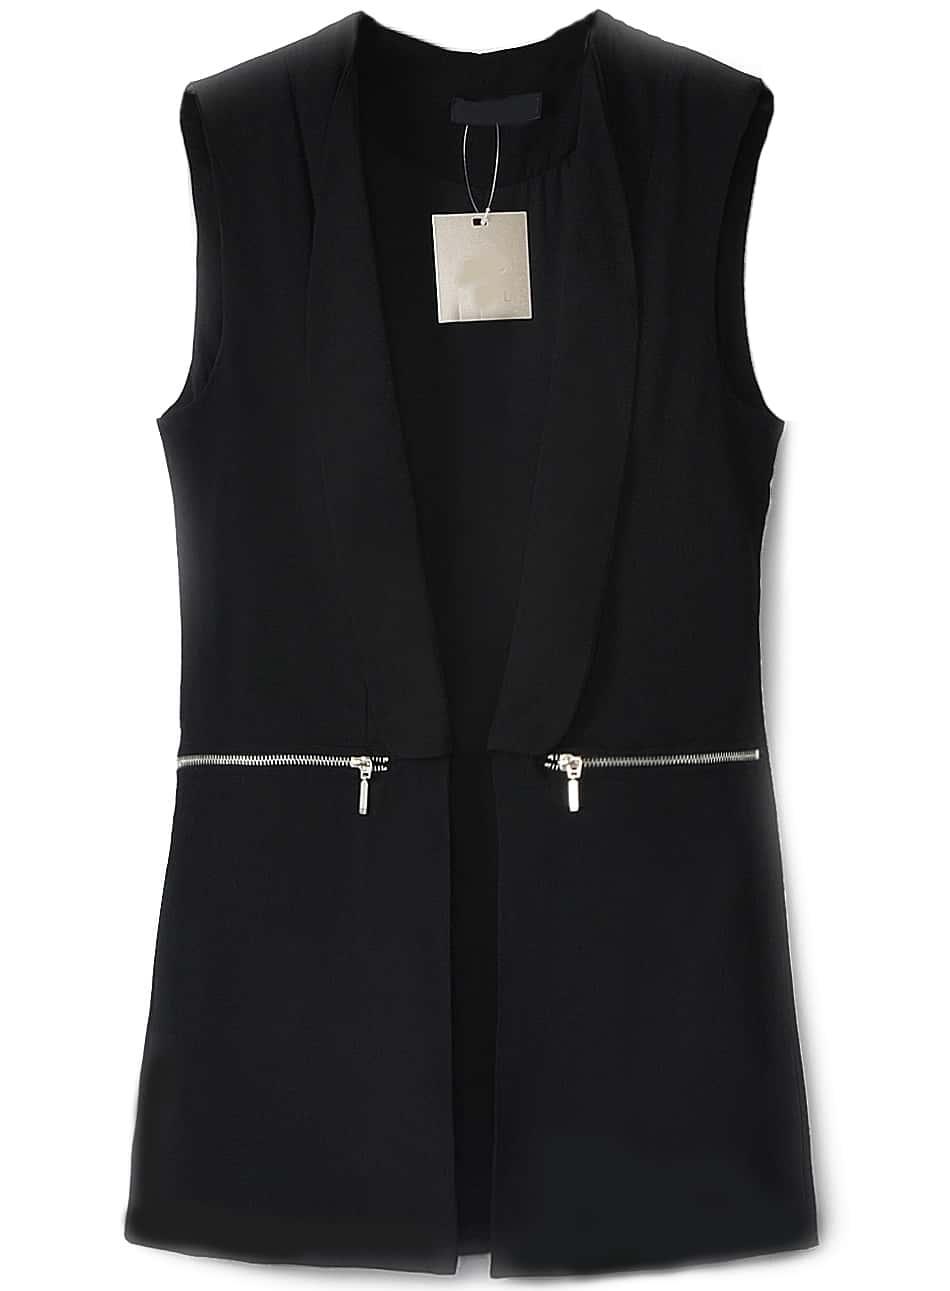 fef117b267c4 Black Lapel Sleeveless Zipper Embellished Blazer | SHEIN